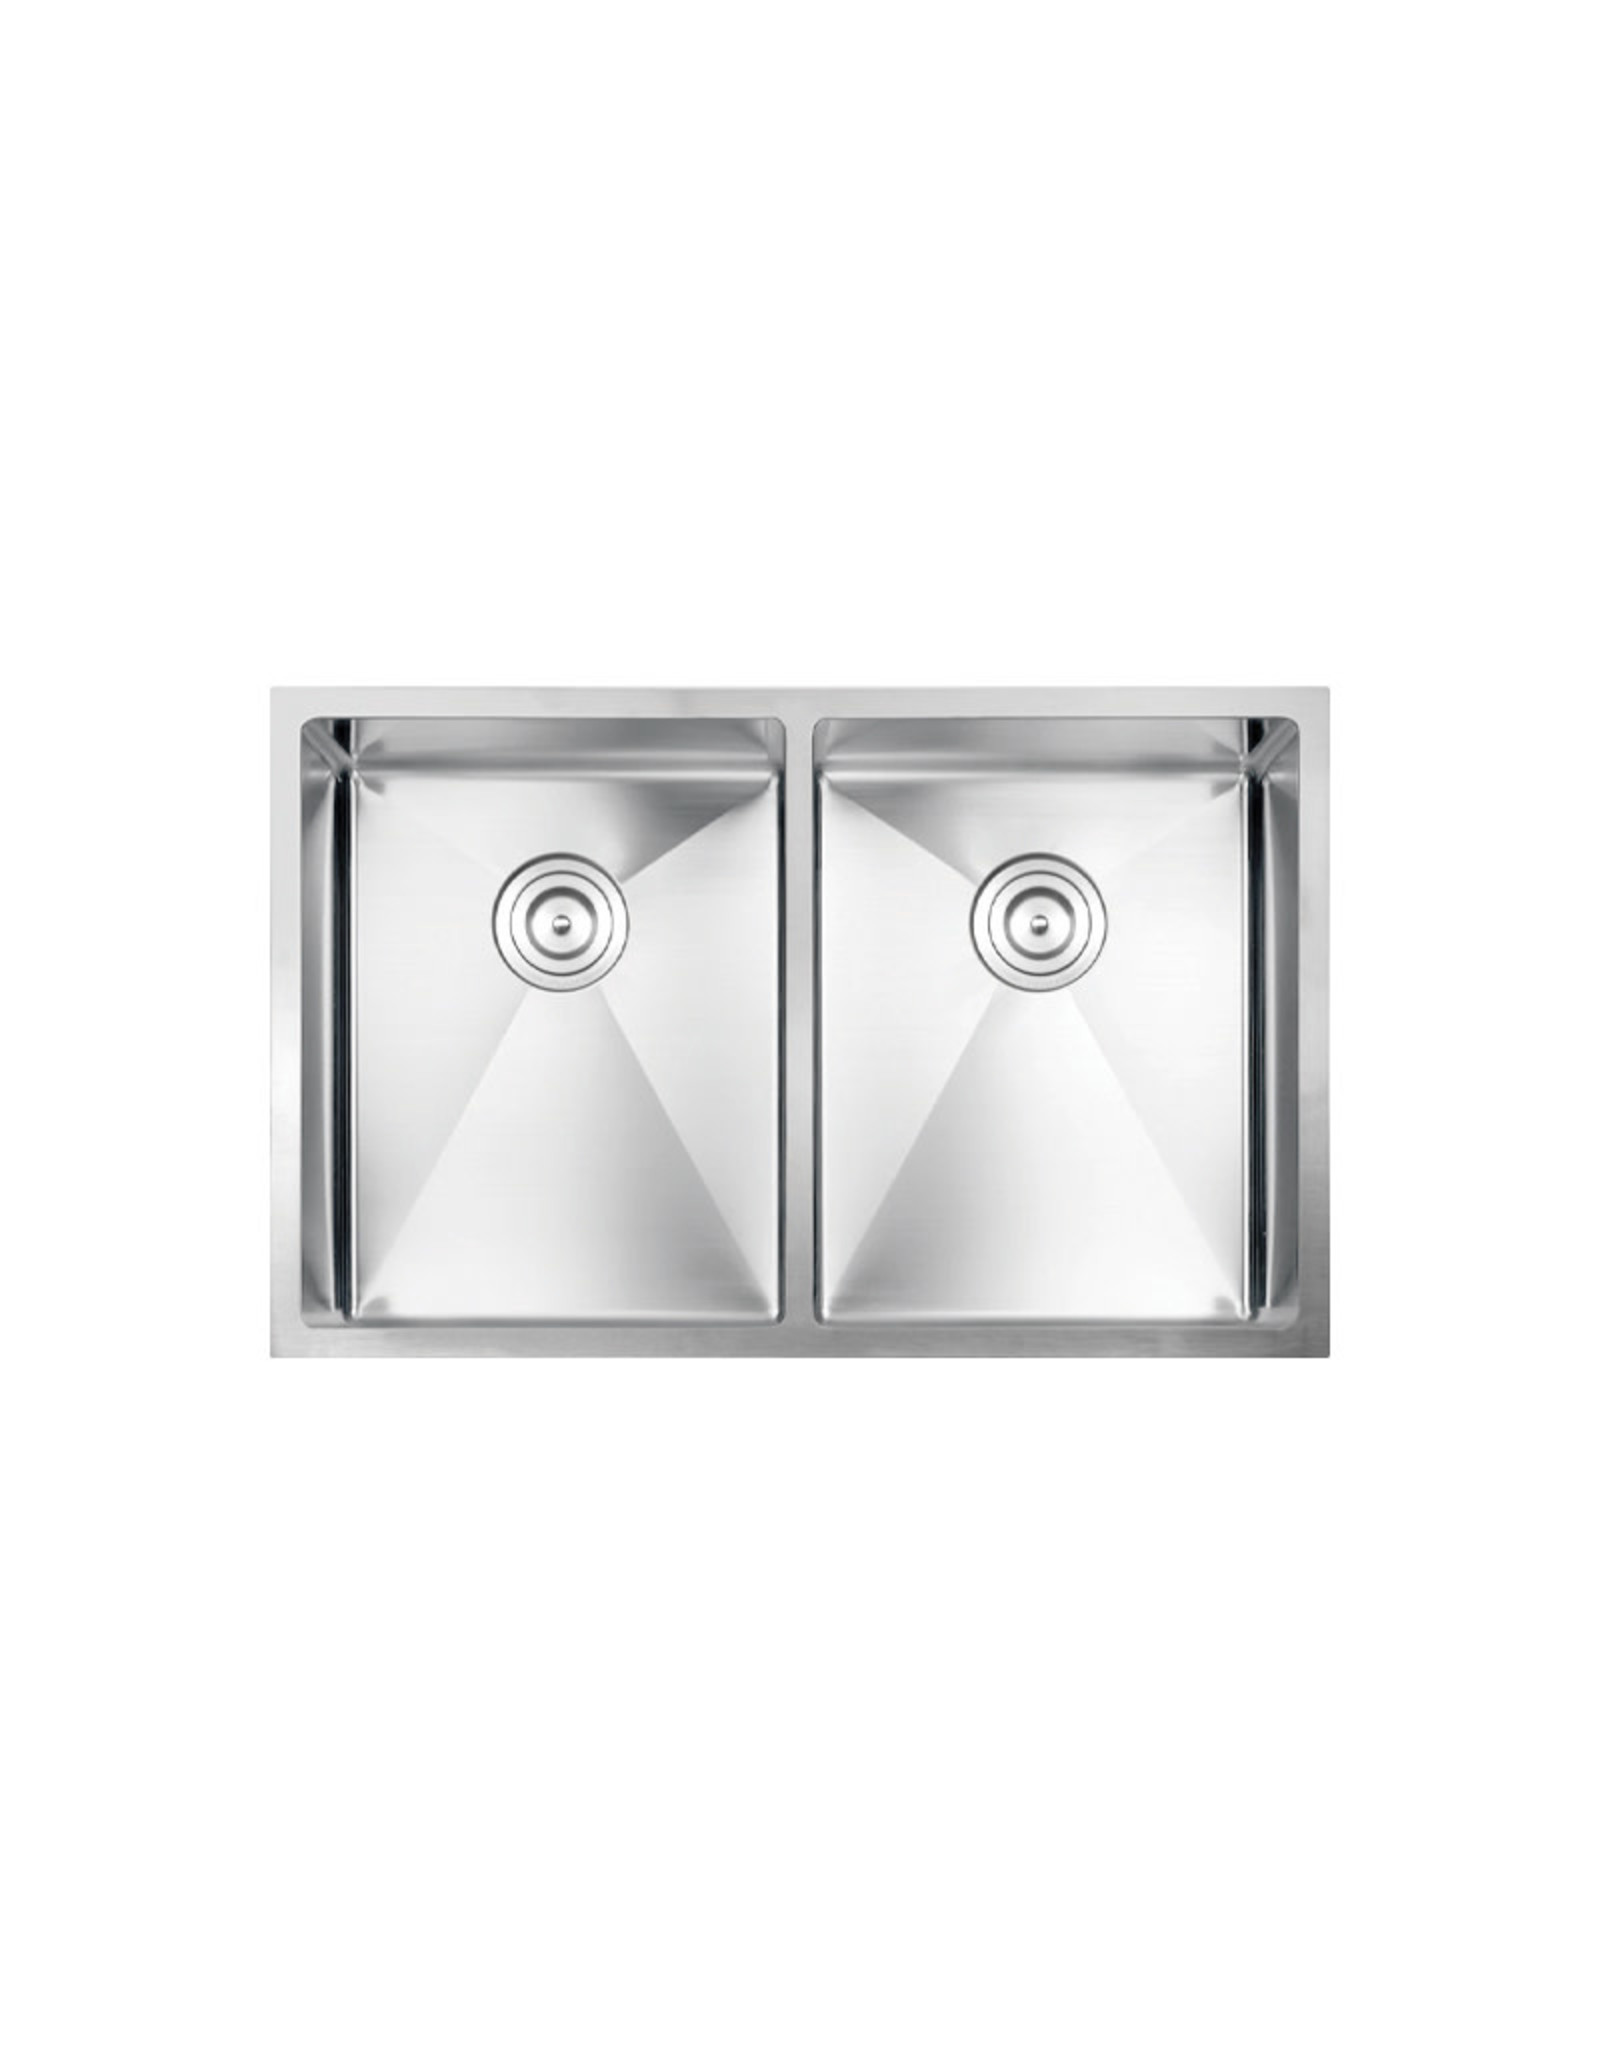 "Vogt Modling 16R Undermount Kitchen Sink Double Bowl (50/50) 30"" x 18"" x 10"" With Bottom Grates"